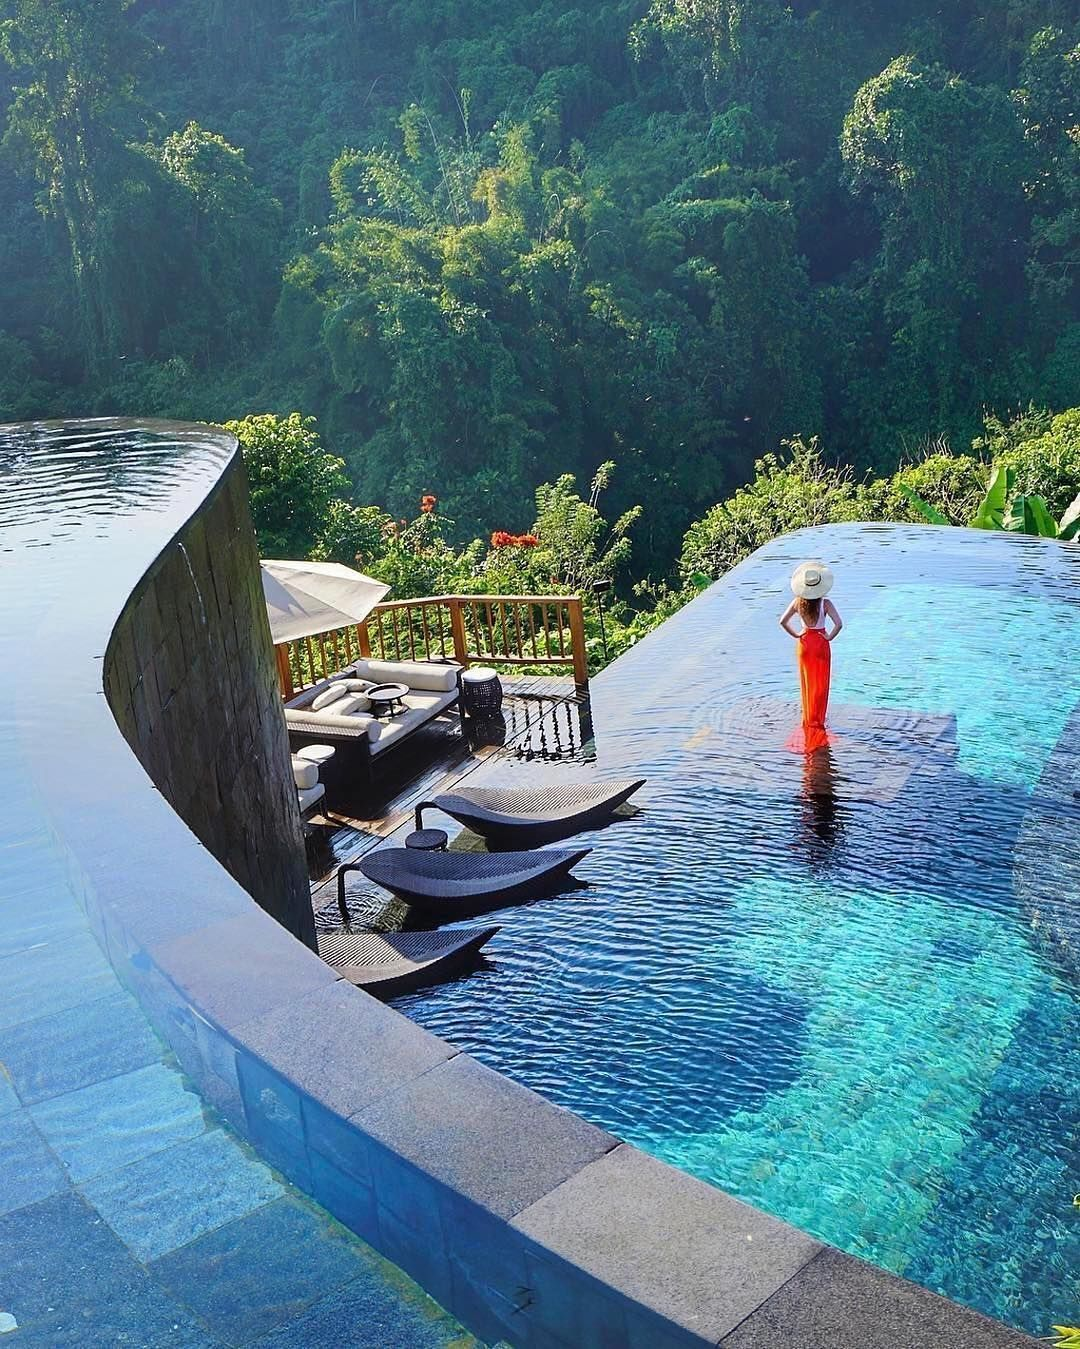 Best Honeymoon Places Bali: Hanging Gardens Of Bali, Ubud, #Regram @we.love.hotels